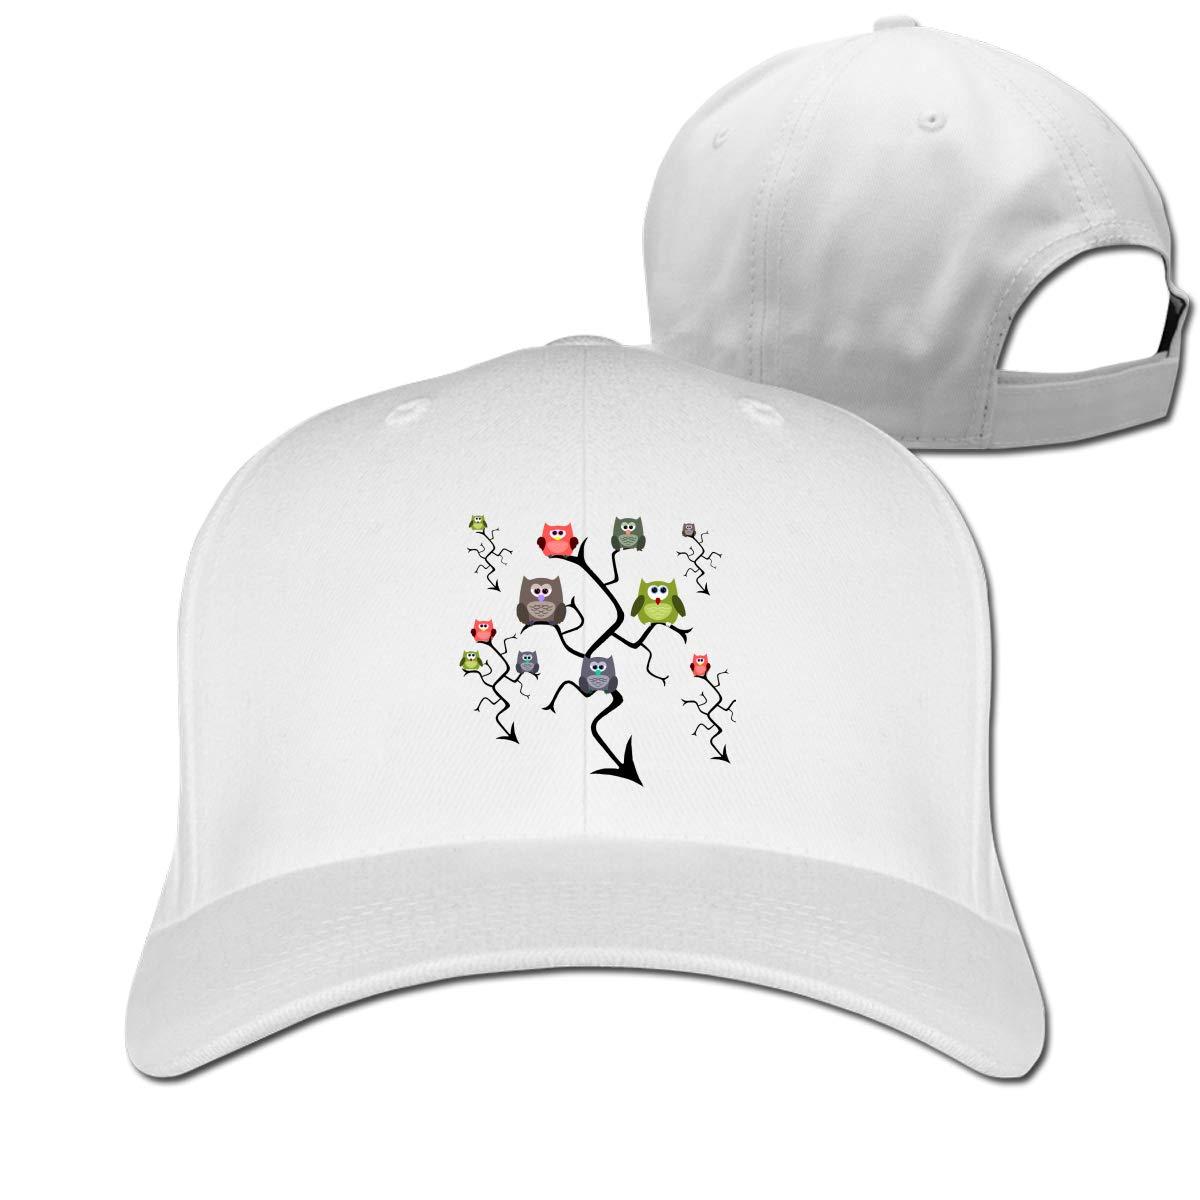 I Love Broccoli Baseball Dad Cap Classic Adjustable Sports Hat Unisex